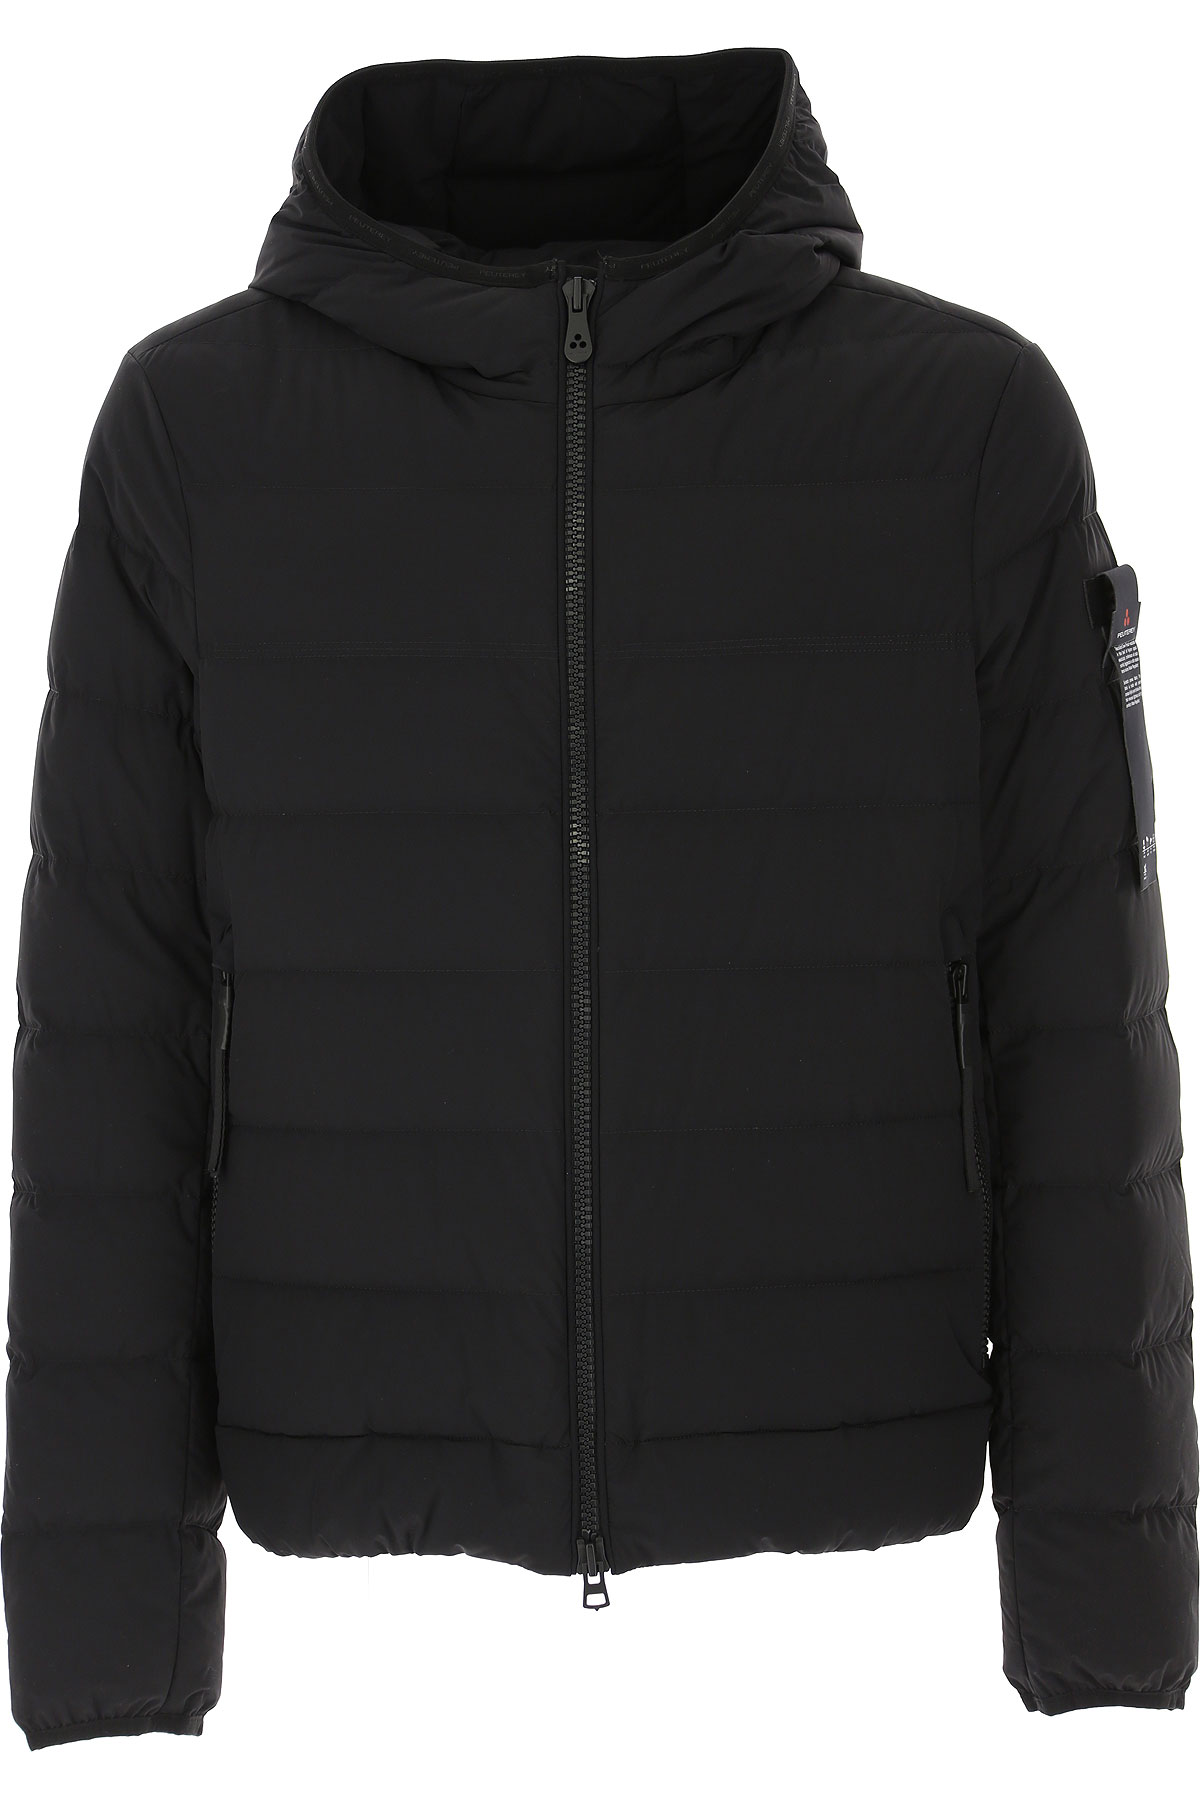 Peuterey Down Jacket for Men, Puffer Ski Jacket On Sale, Black, Down, 2019, L M S XL